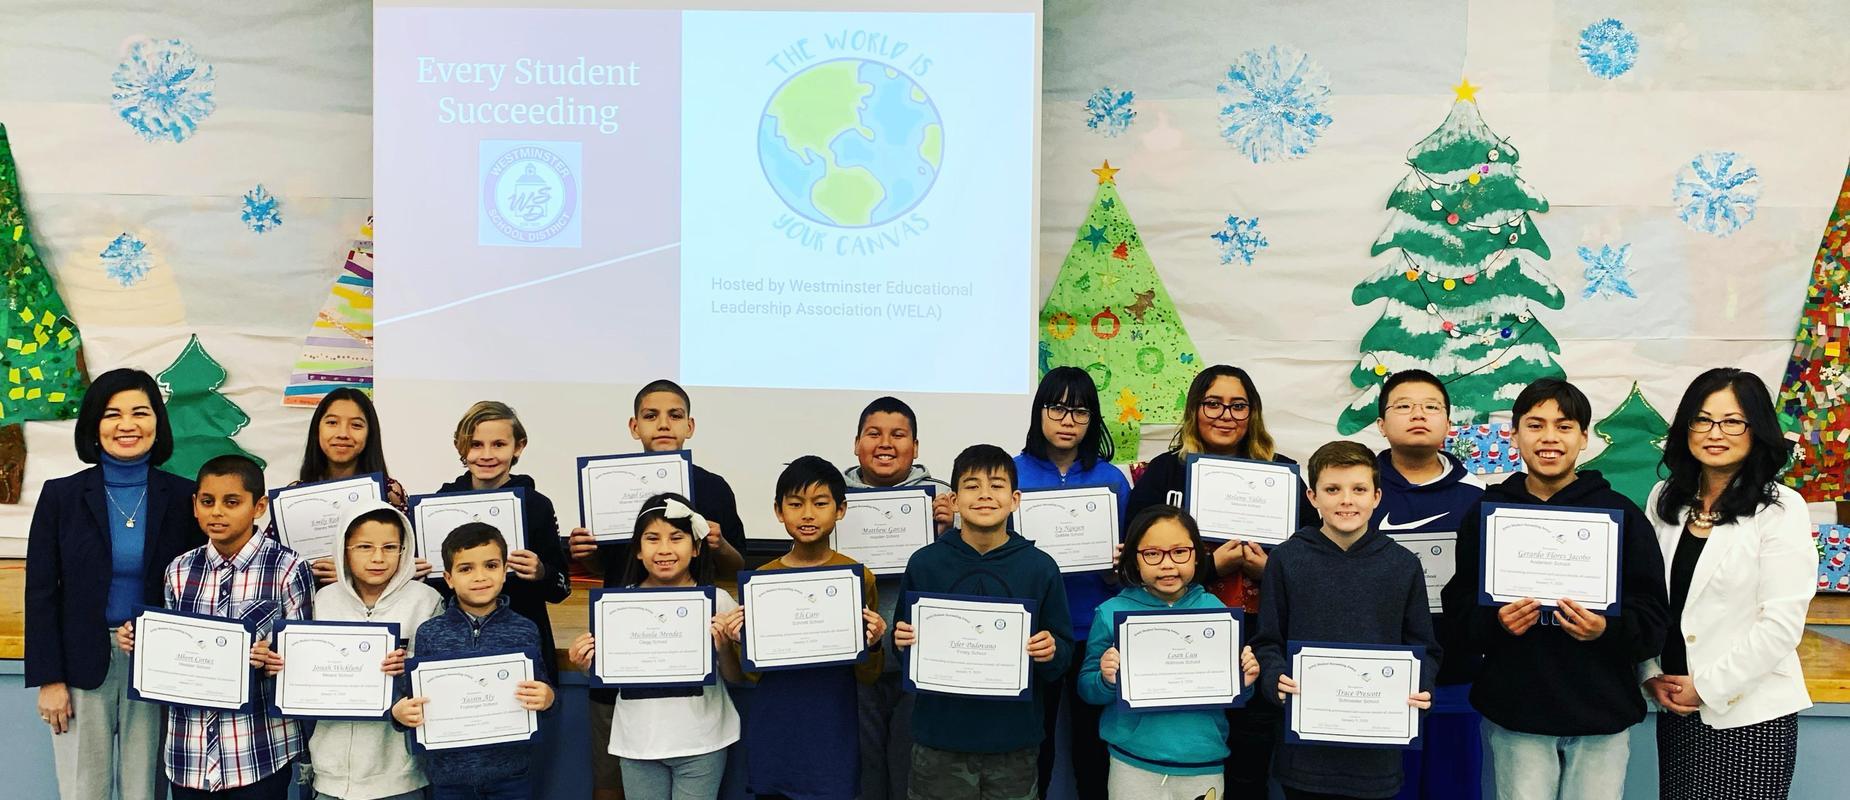 2019-2020 Every Student Succeeding Awards